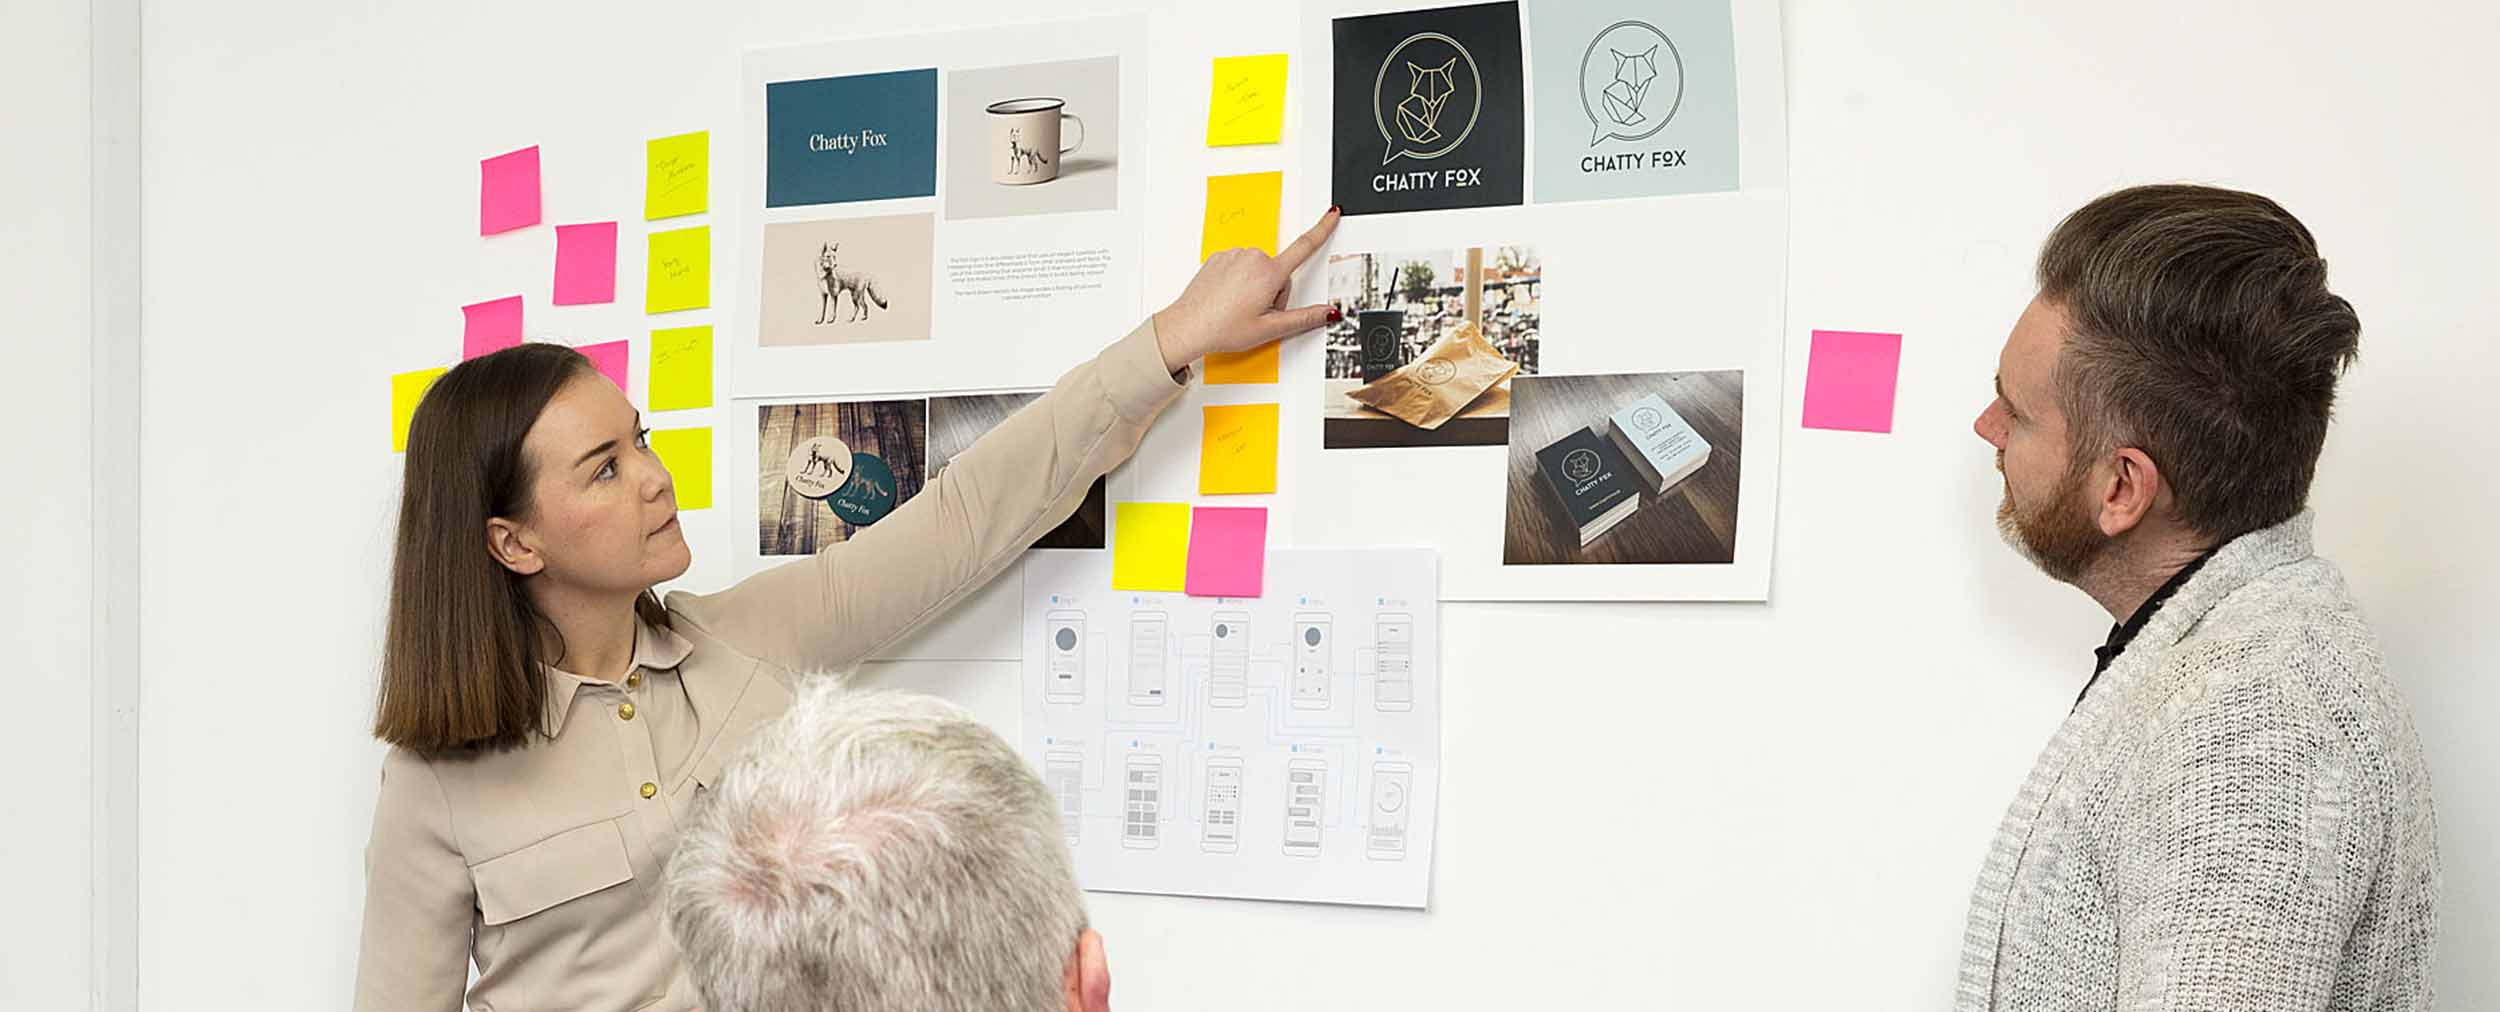 Brandstrategy